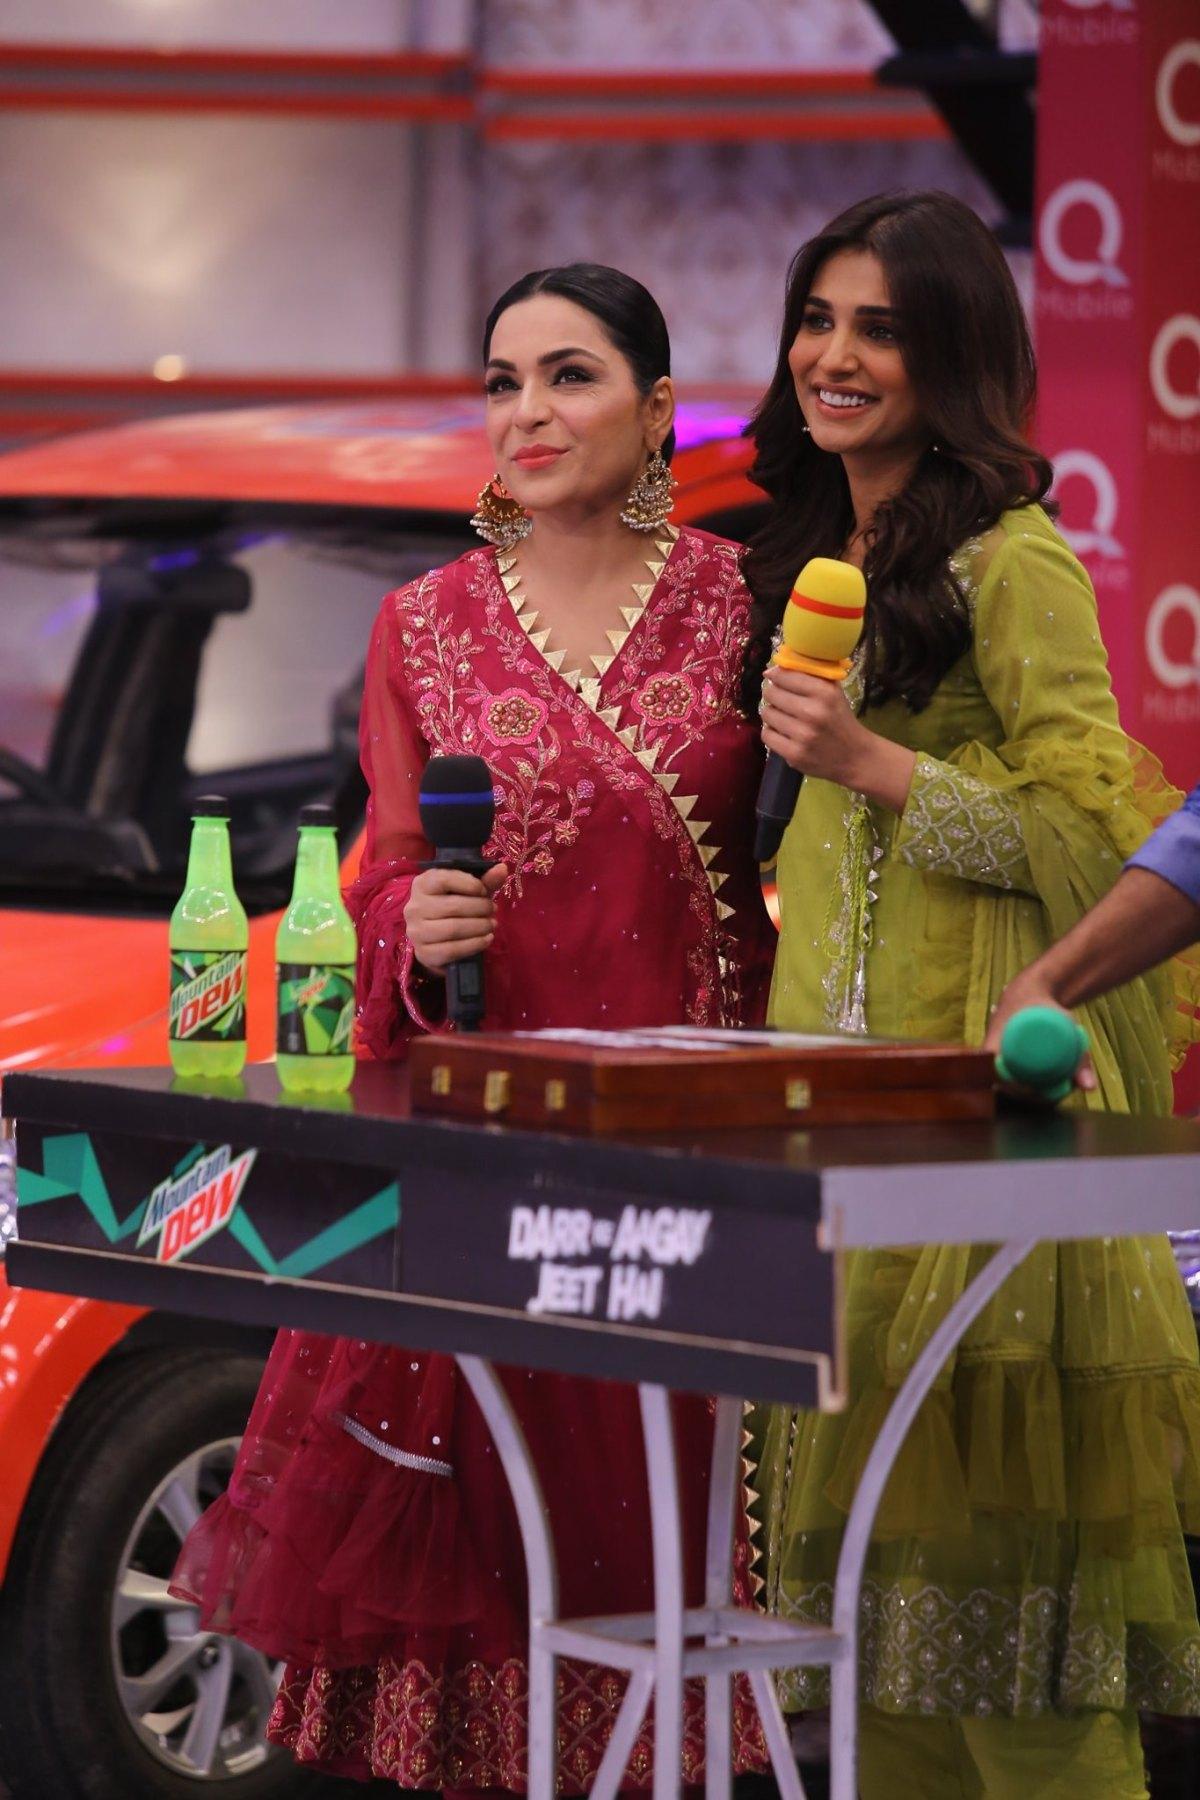 Beautiful Actresses Meera Jee & Amna Ilyaas in Jeeto Pakistan